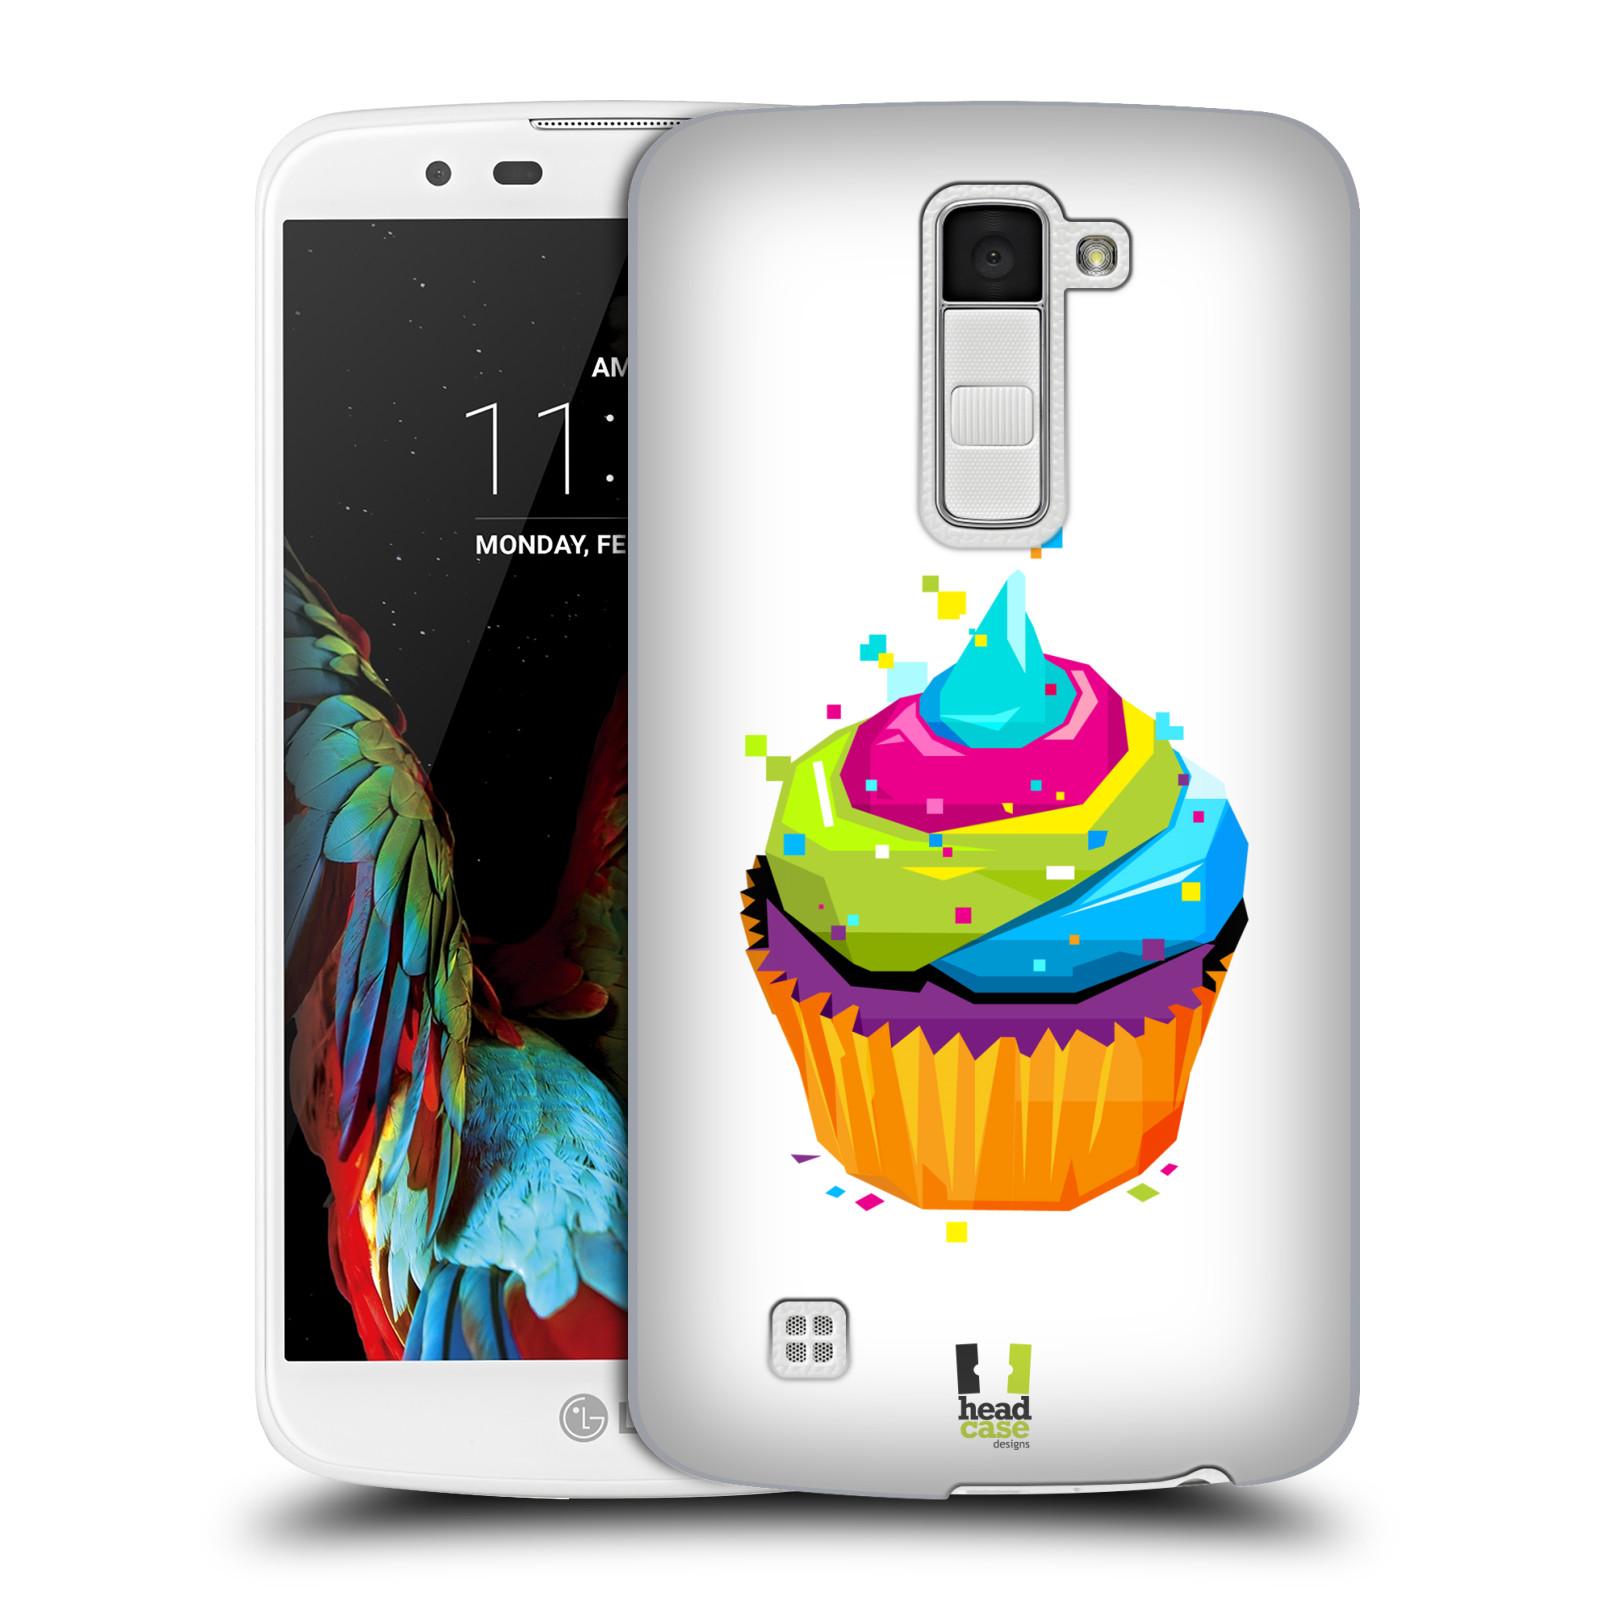 HEAD CASE plastový obal na mobil LG K10 vzor POP ART kubismus dortík